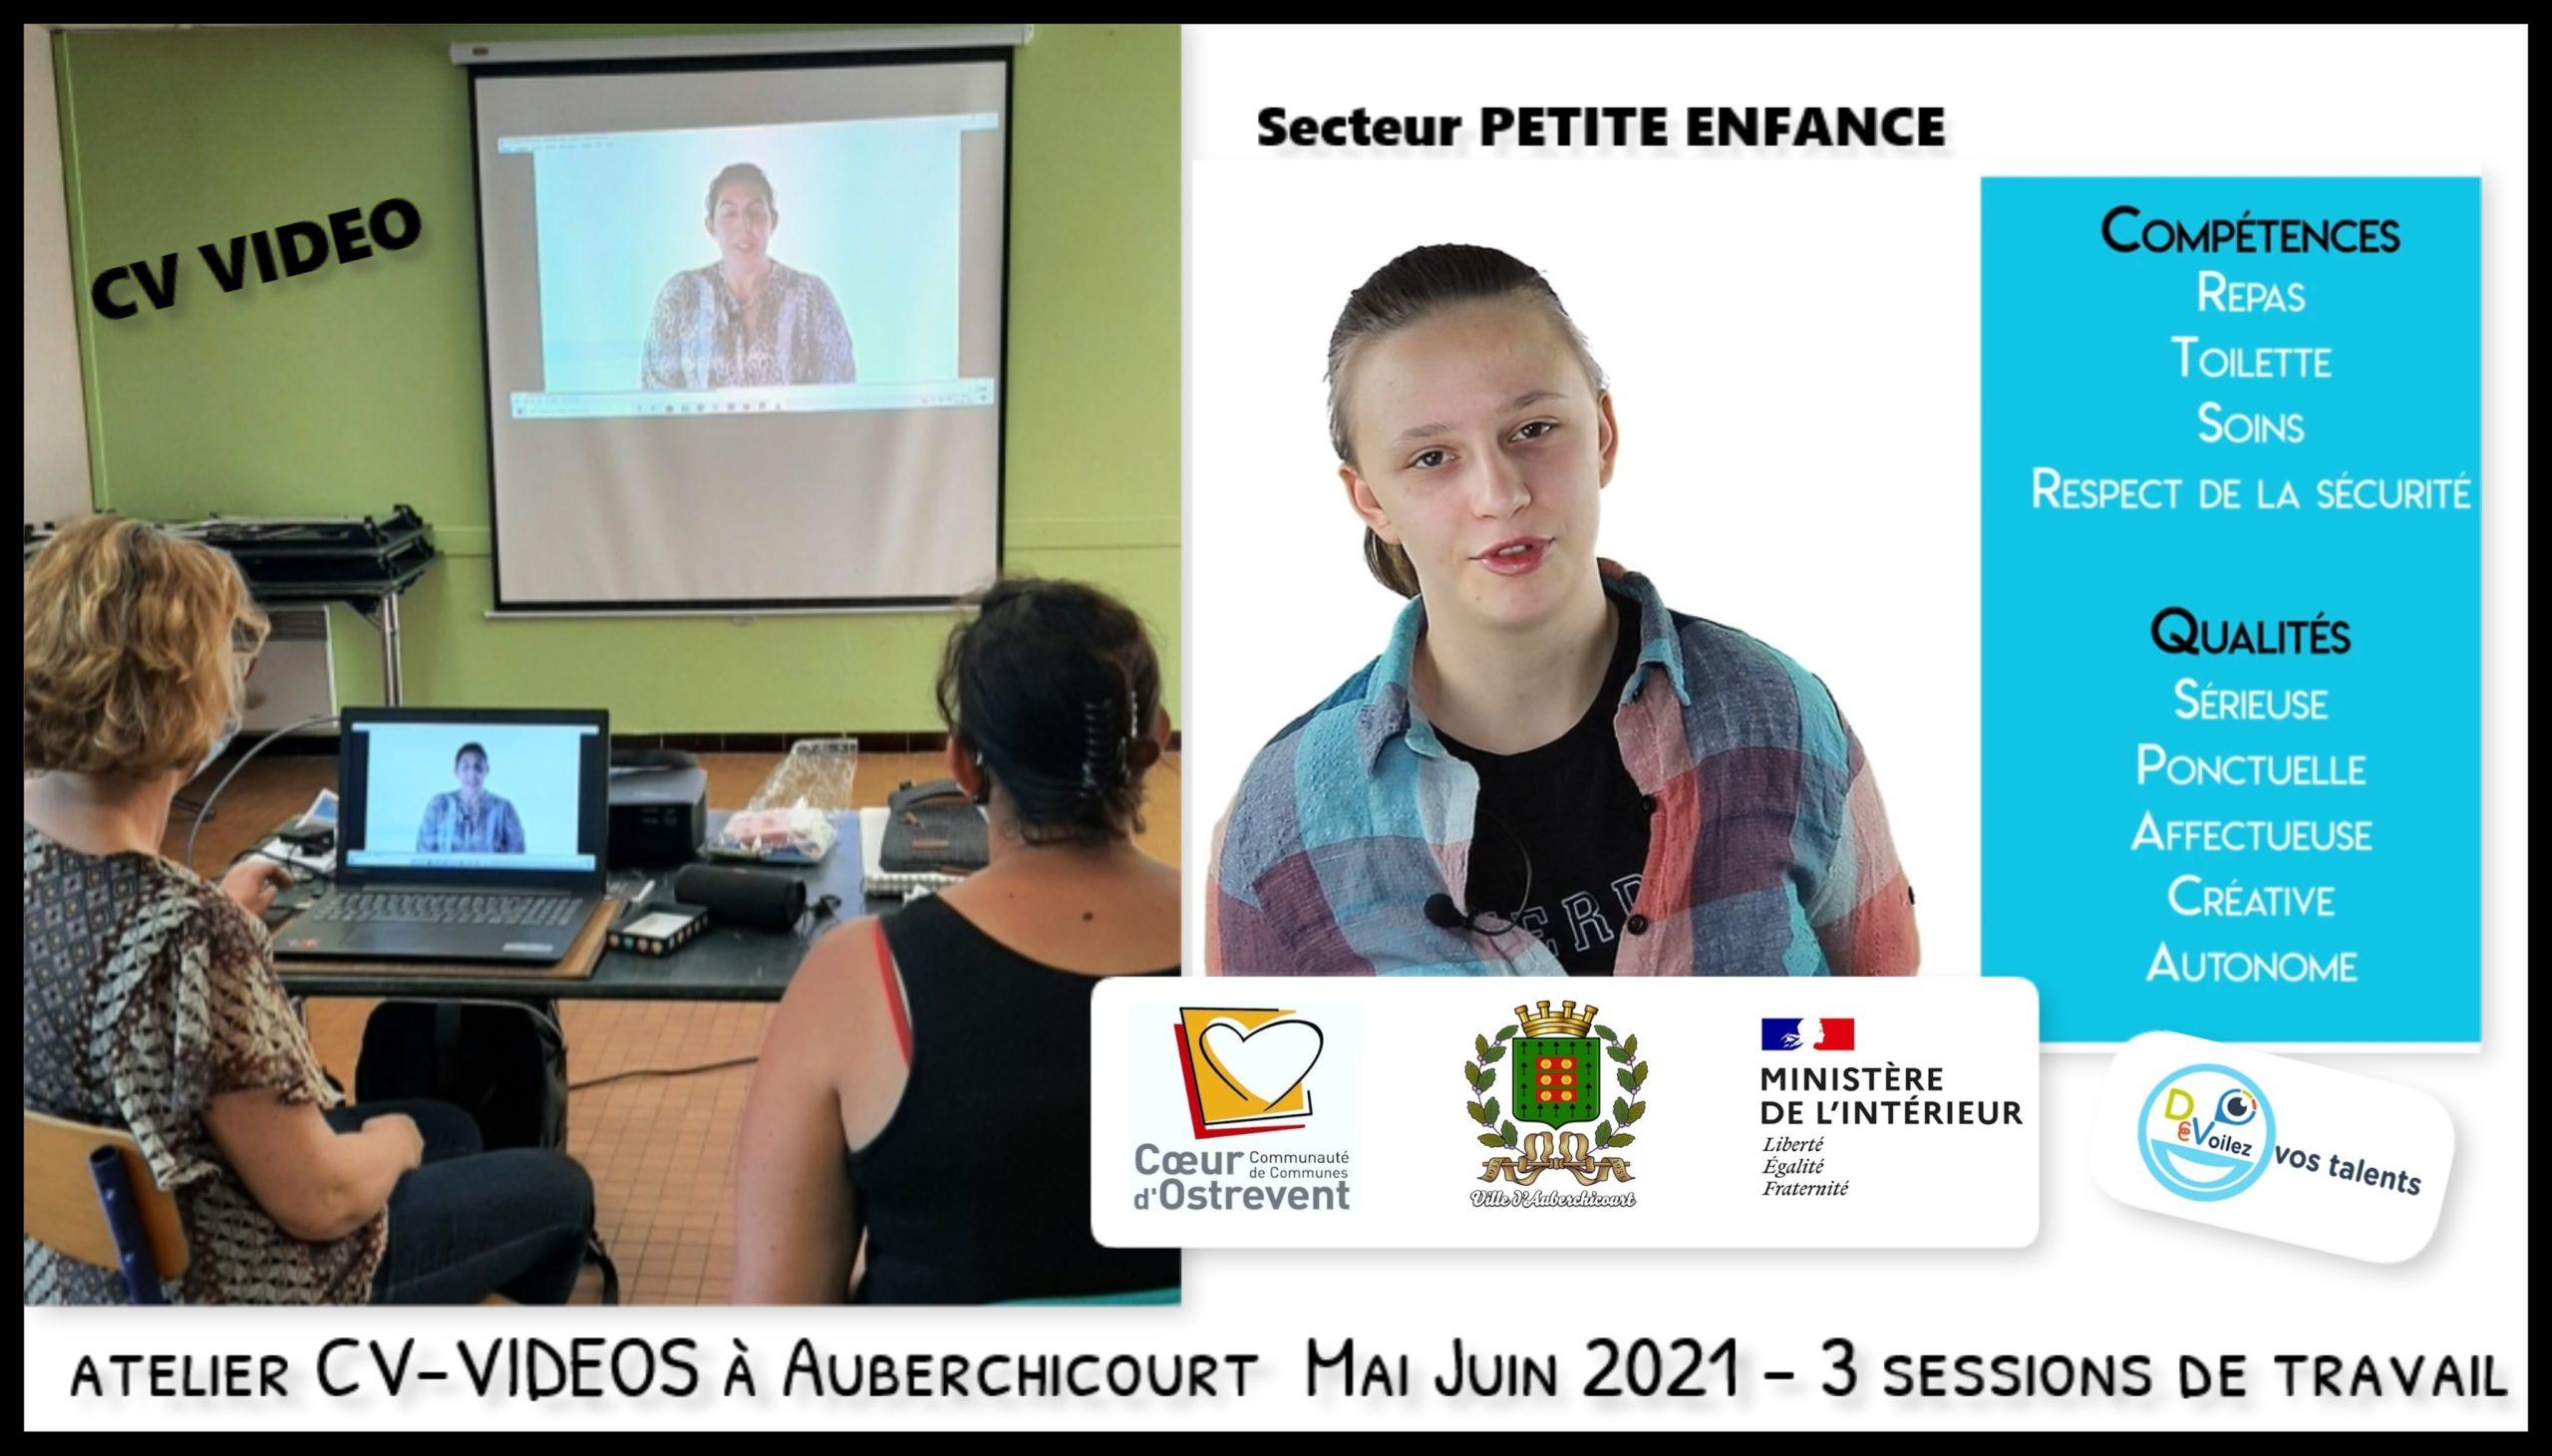 Atelier CV-VIDEO Auberchicourt